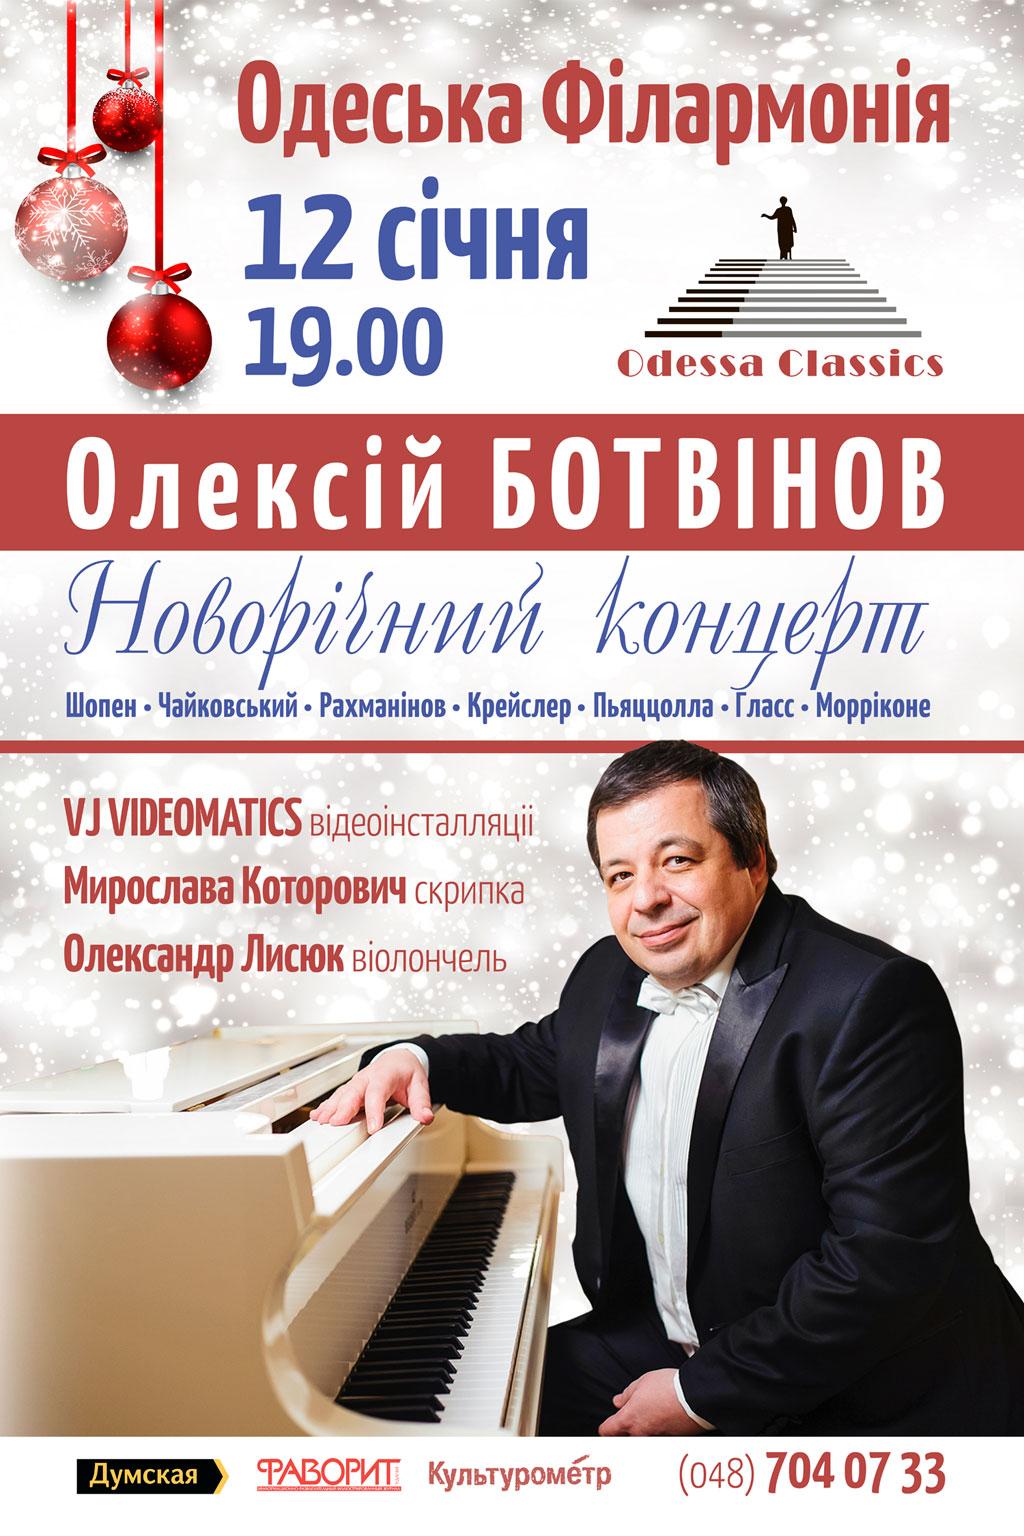 Новогодний концерт в Одессе